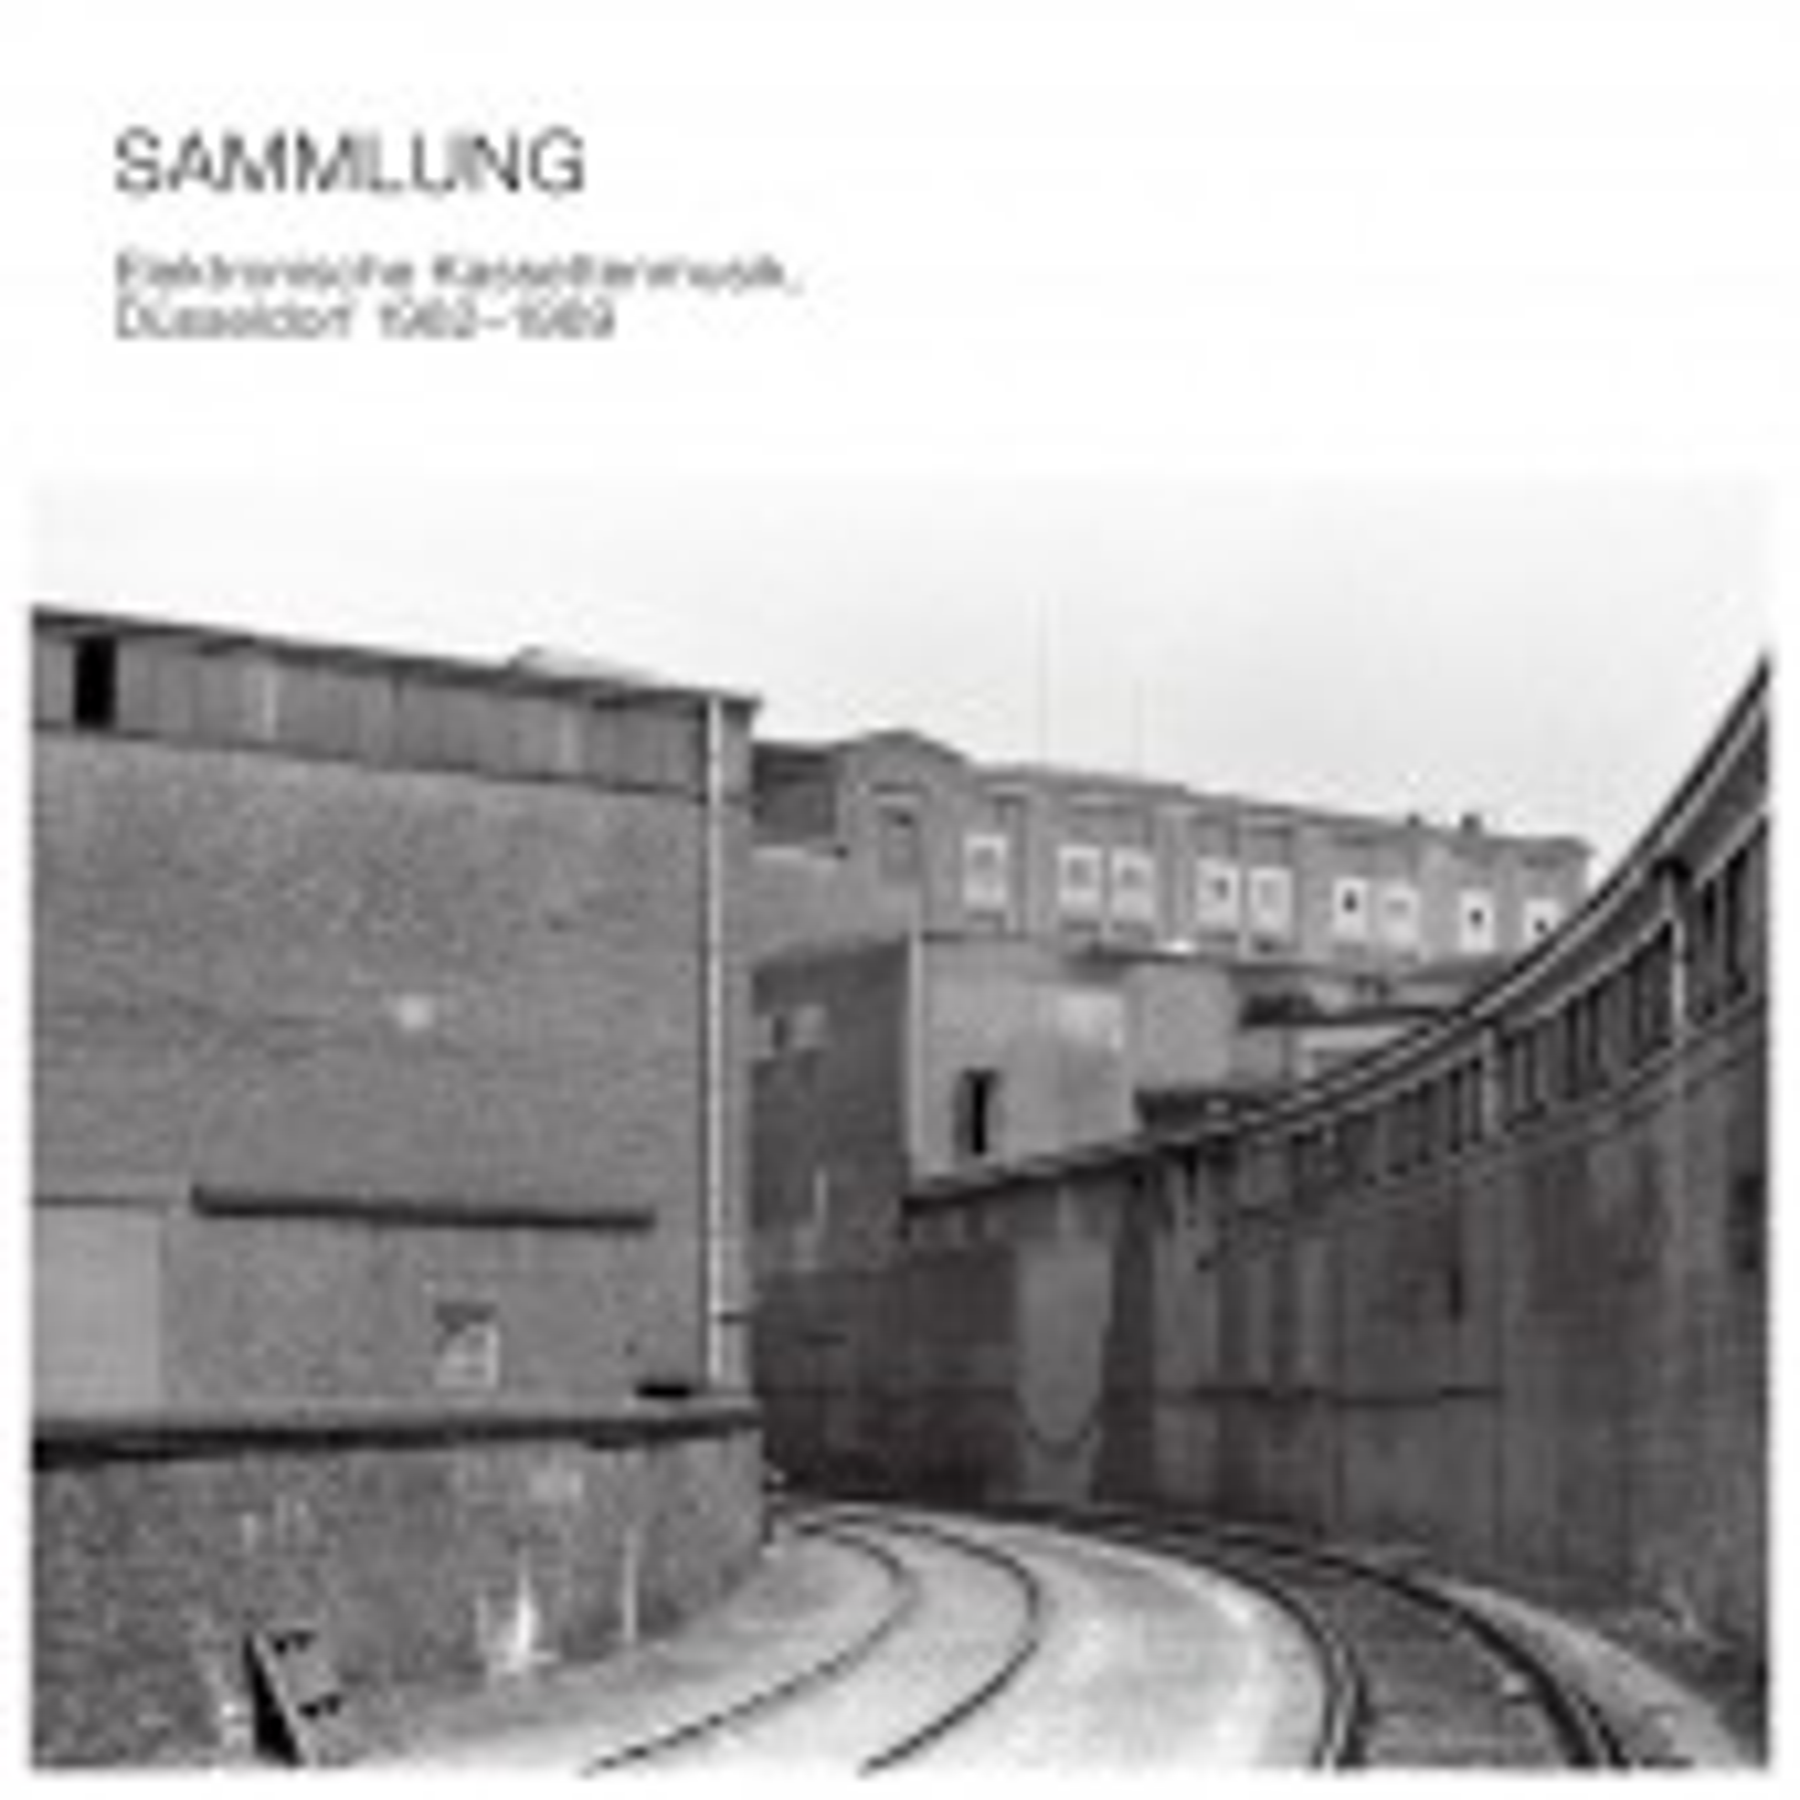 V.A. - Sammlung-Elektronische Kassettenmusik - Düsseldorf 1982-1989 - CD